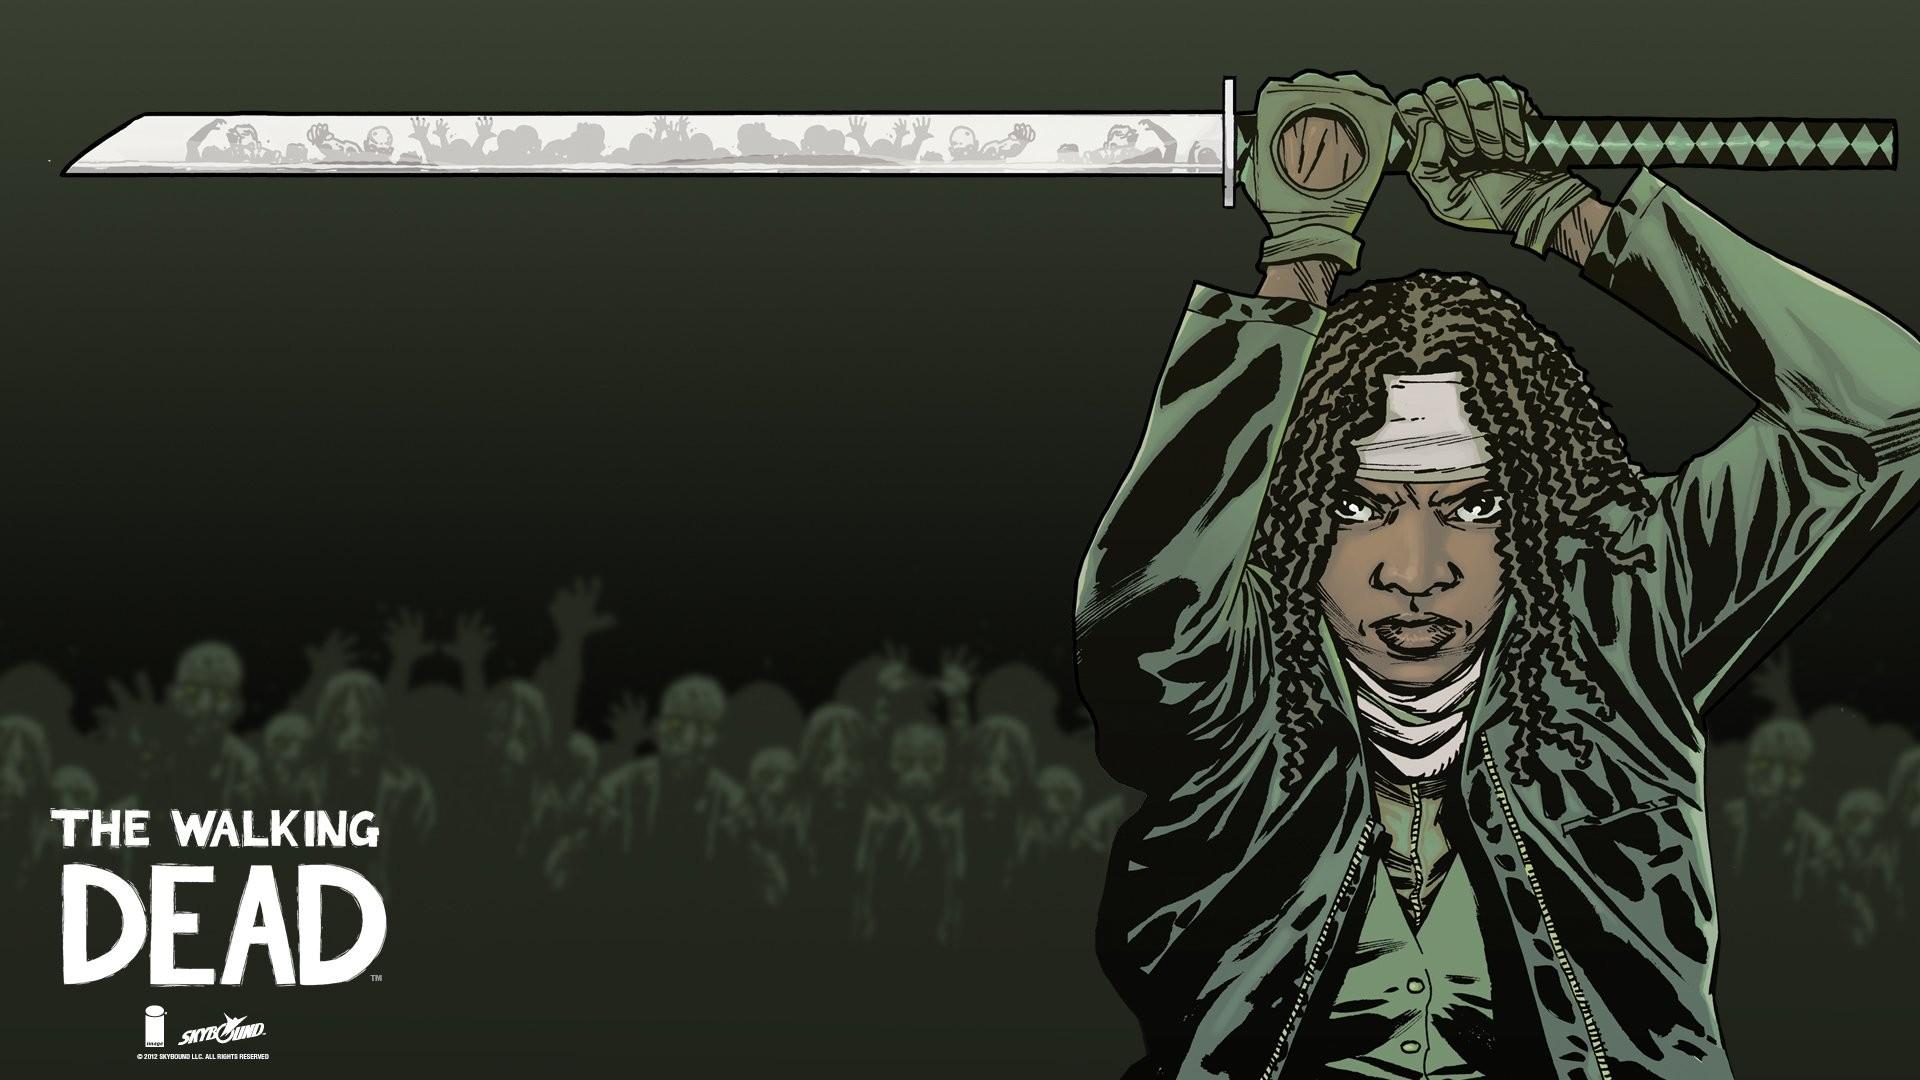 Walking Dead Comic Wallpaper 66 Pictures